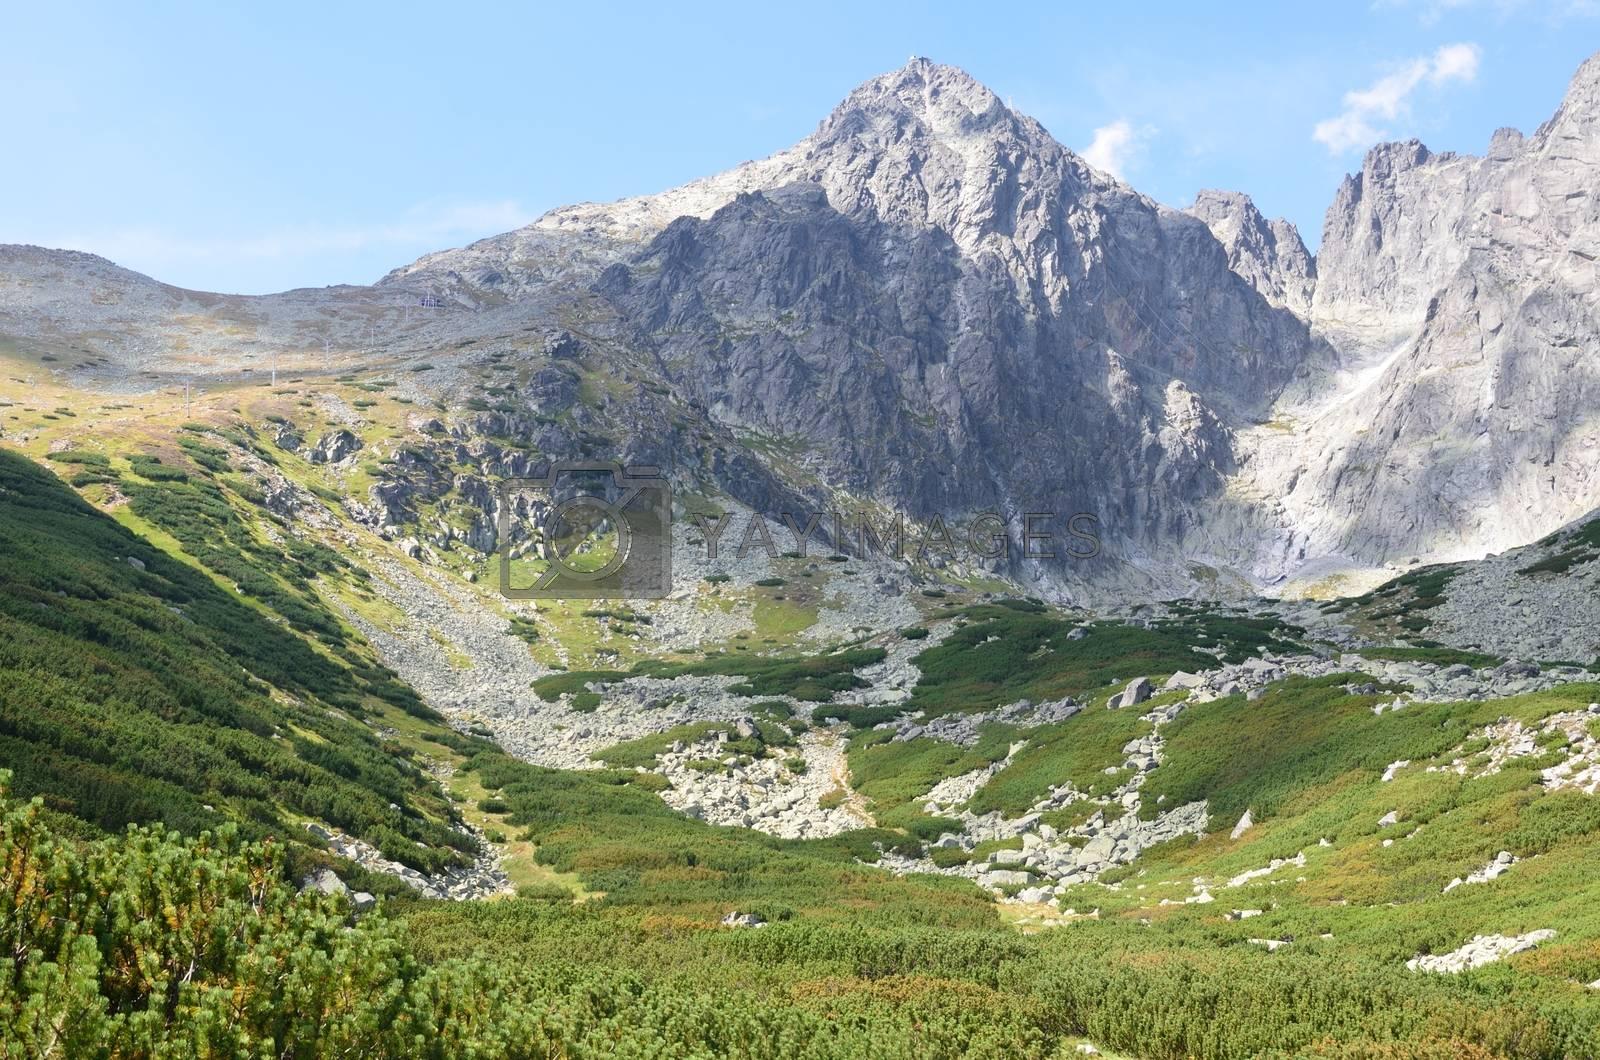 Tatra Mountains in Slovakia  Lomnicky stit